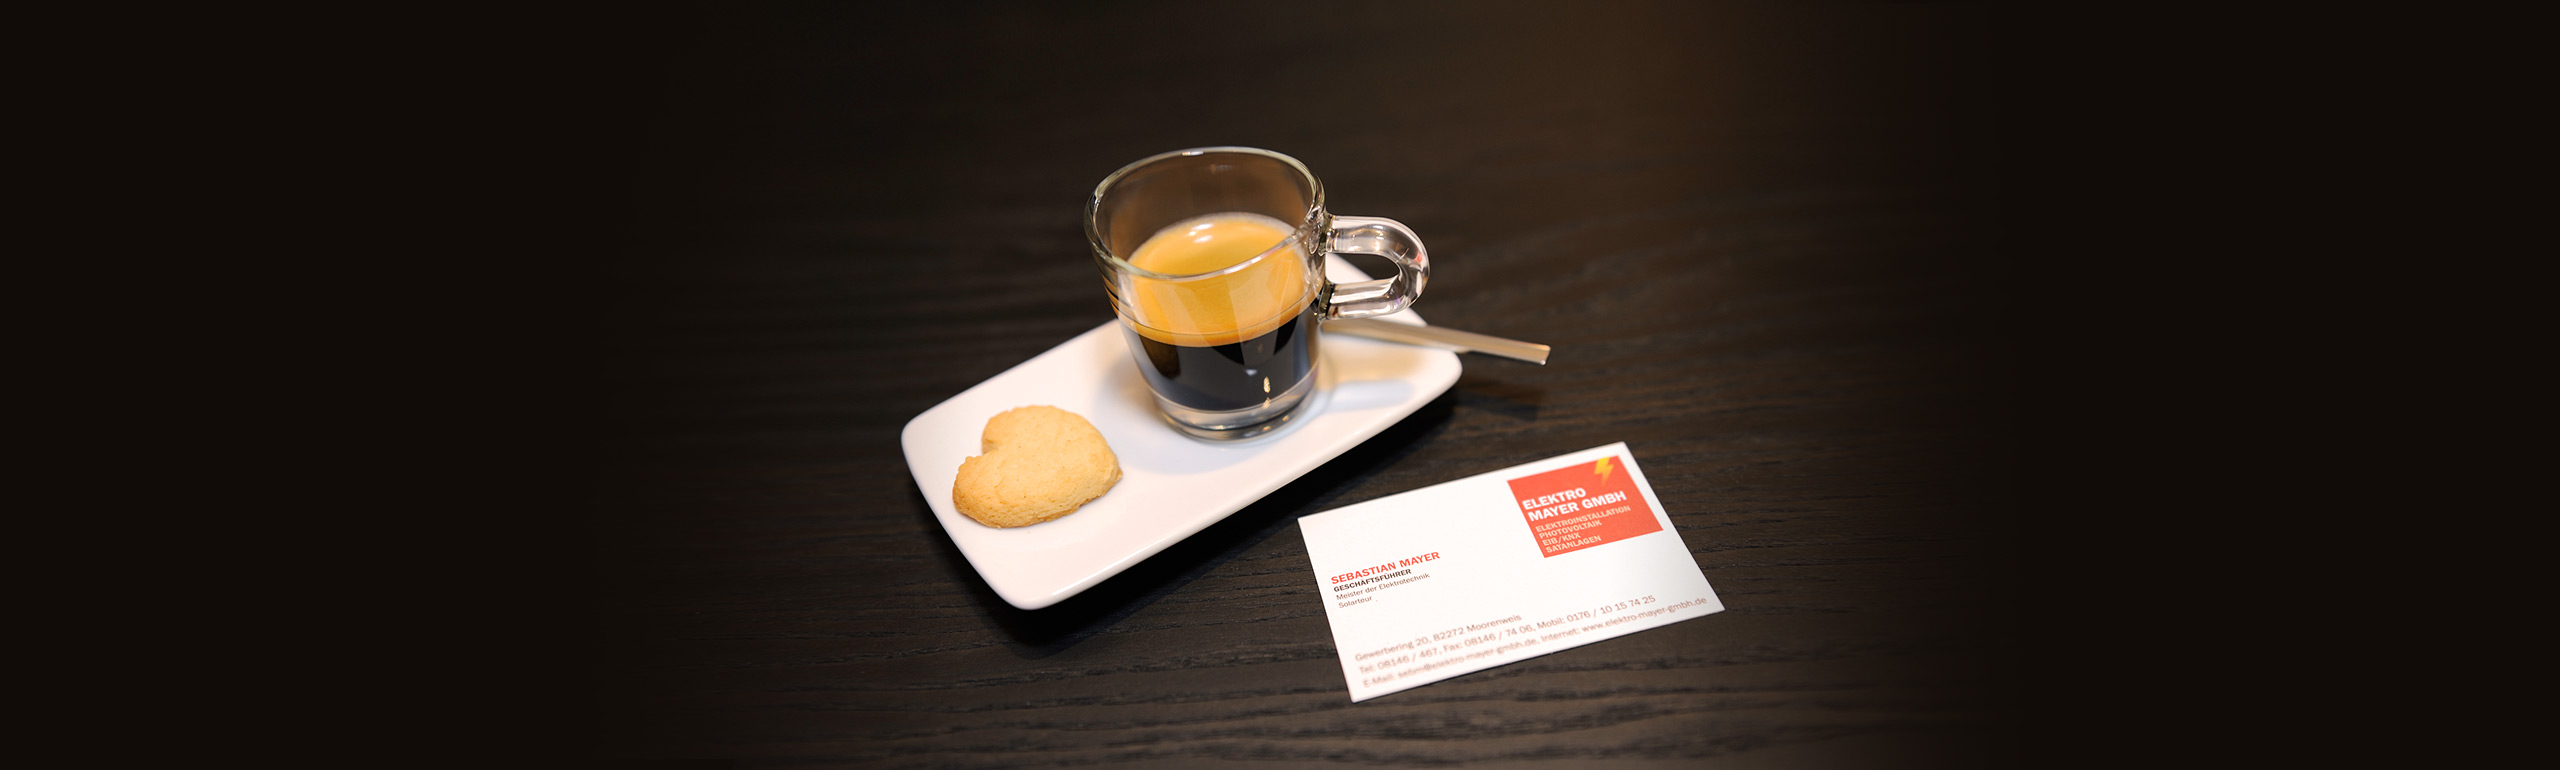 slider_home_kaffee1